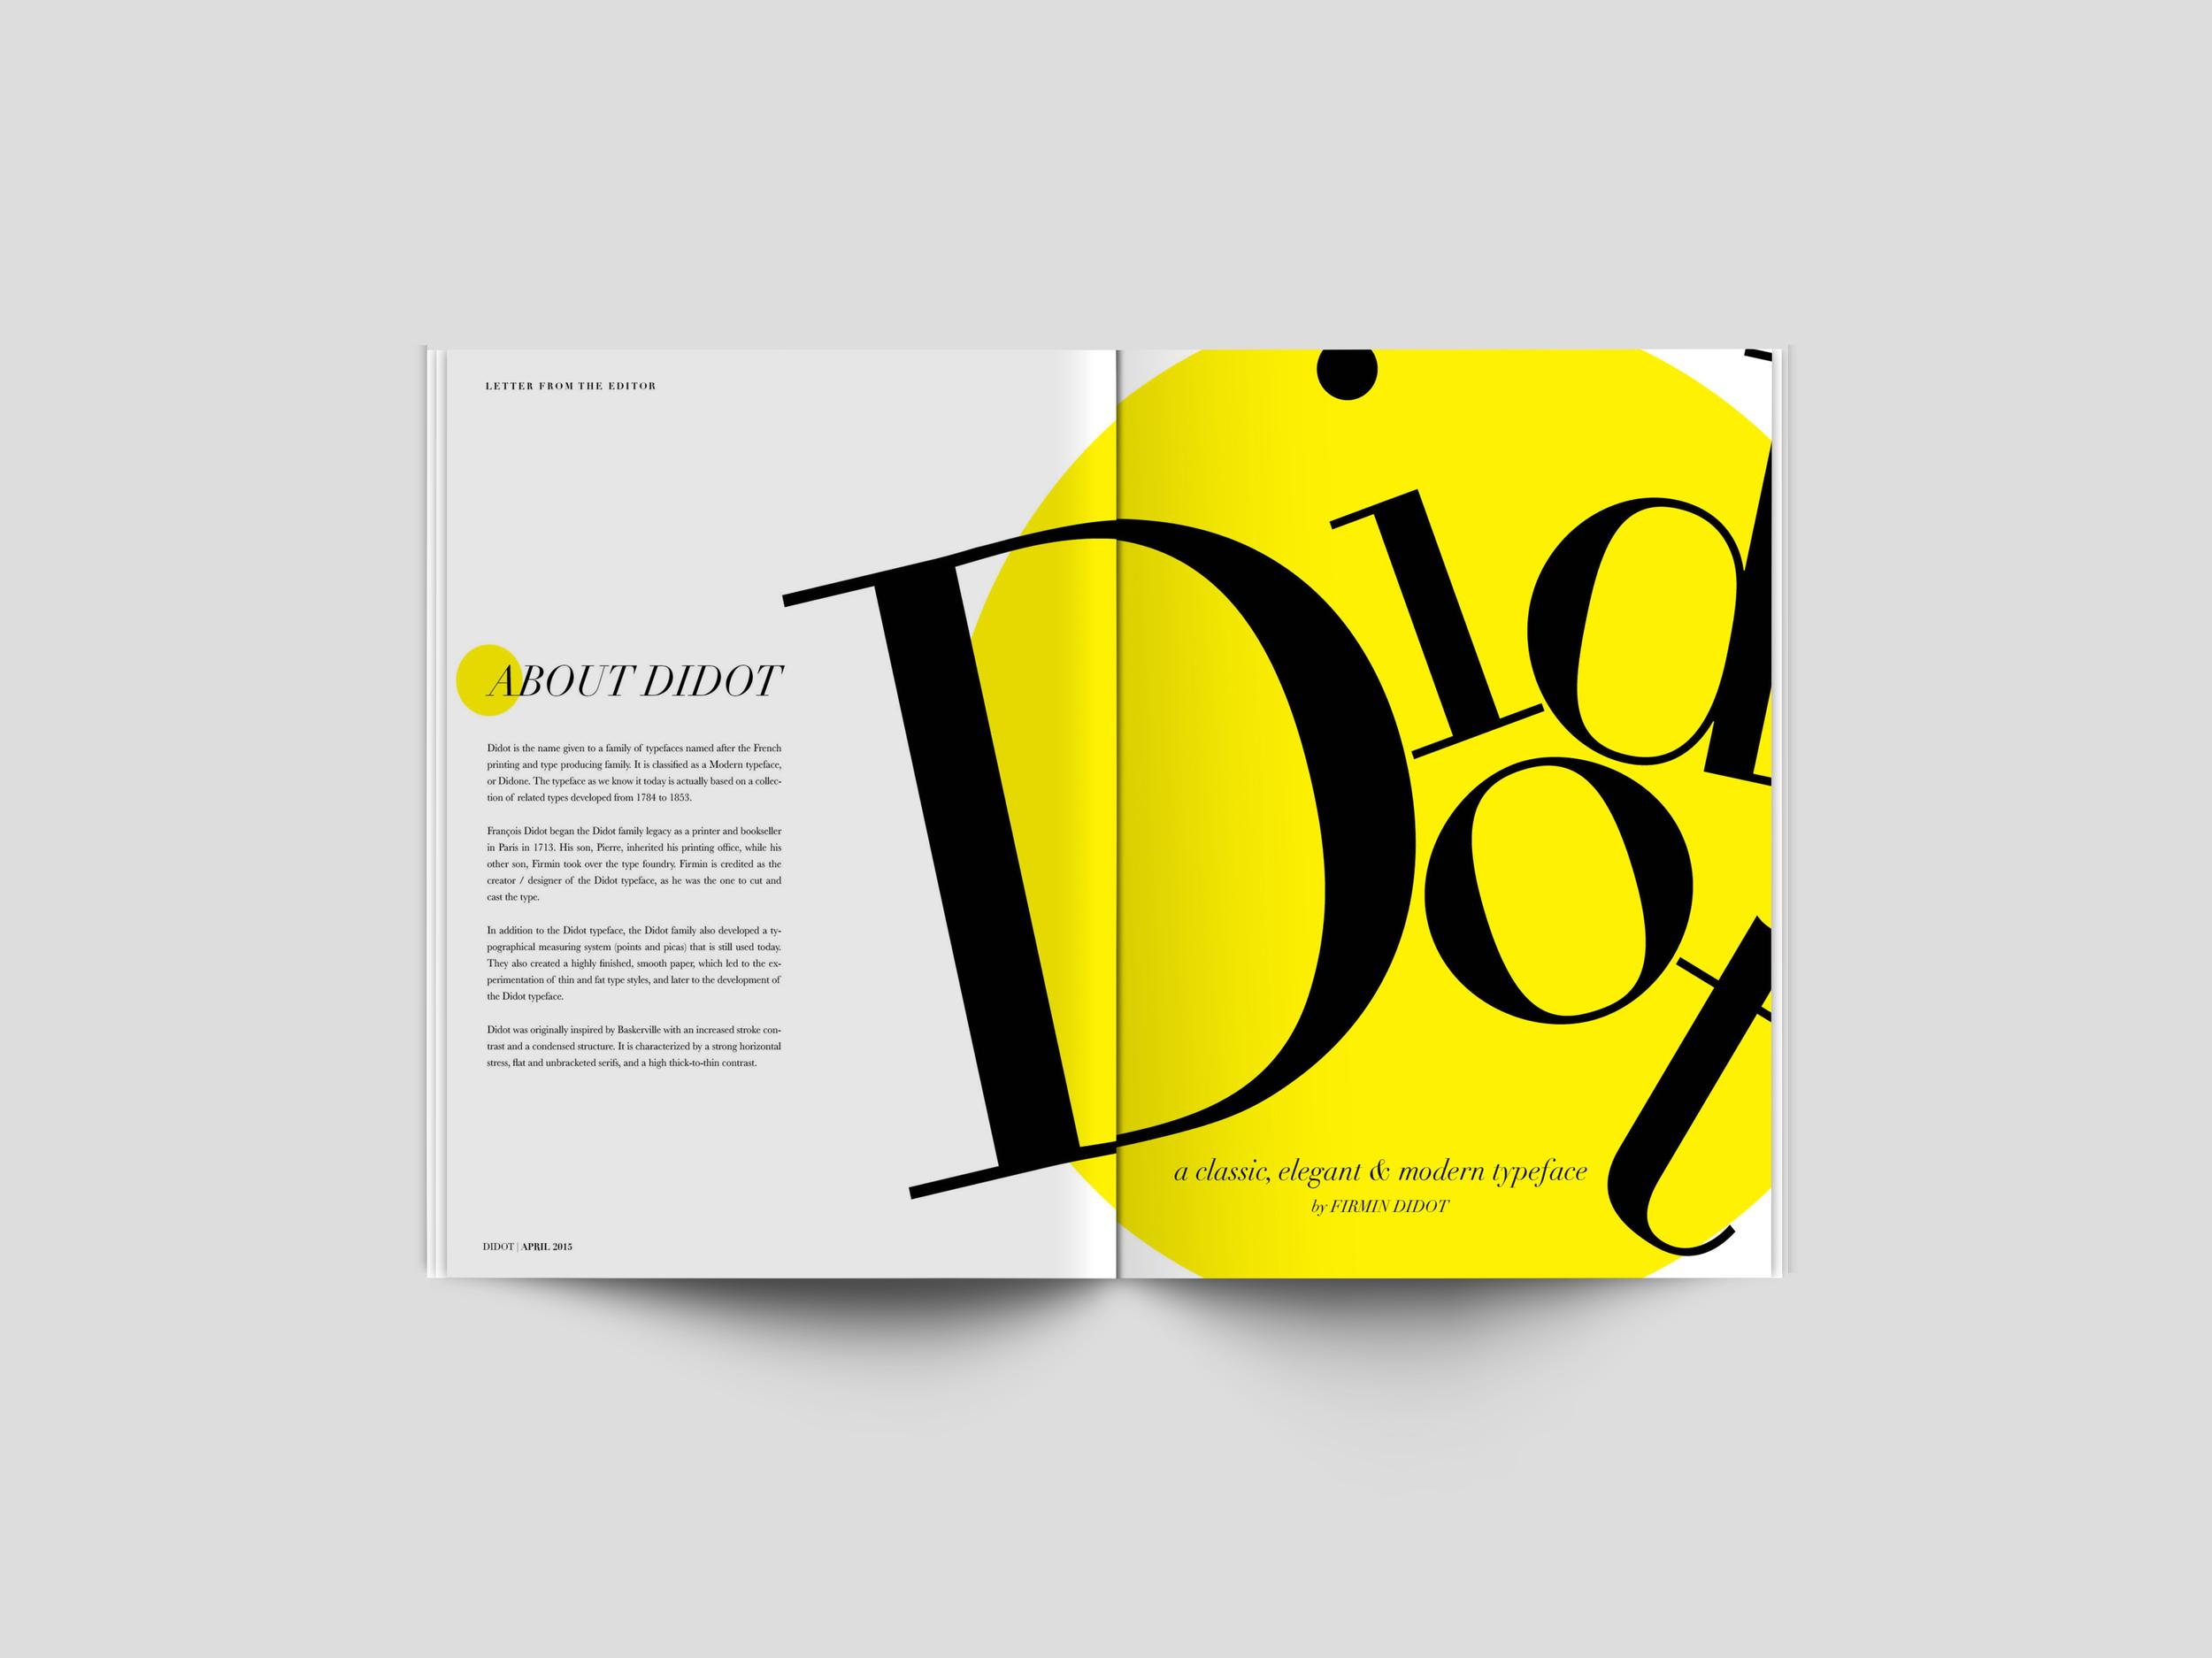 Didot type specimen book.